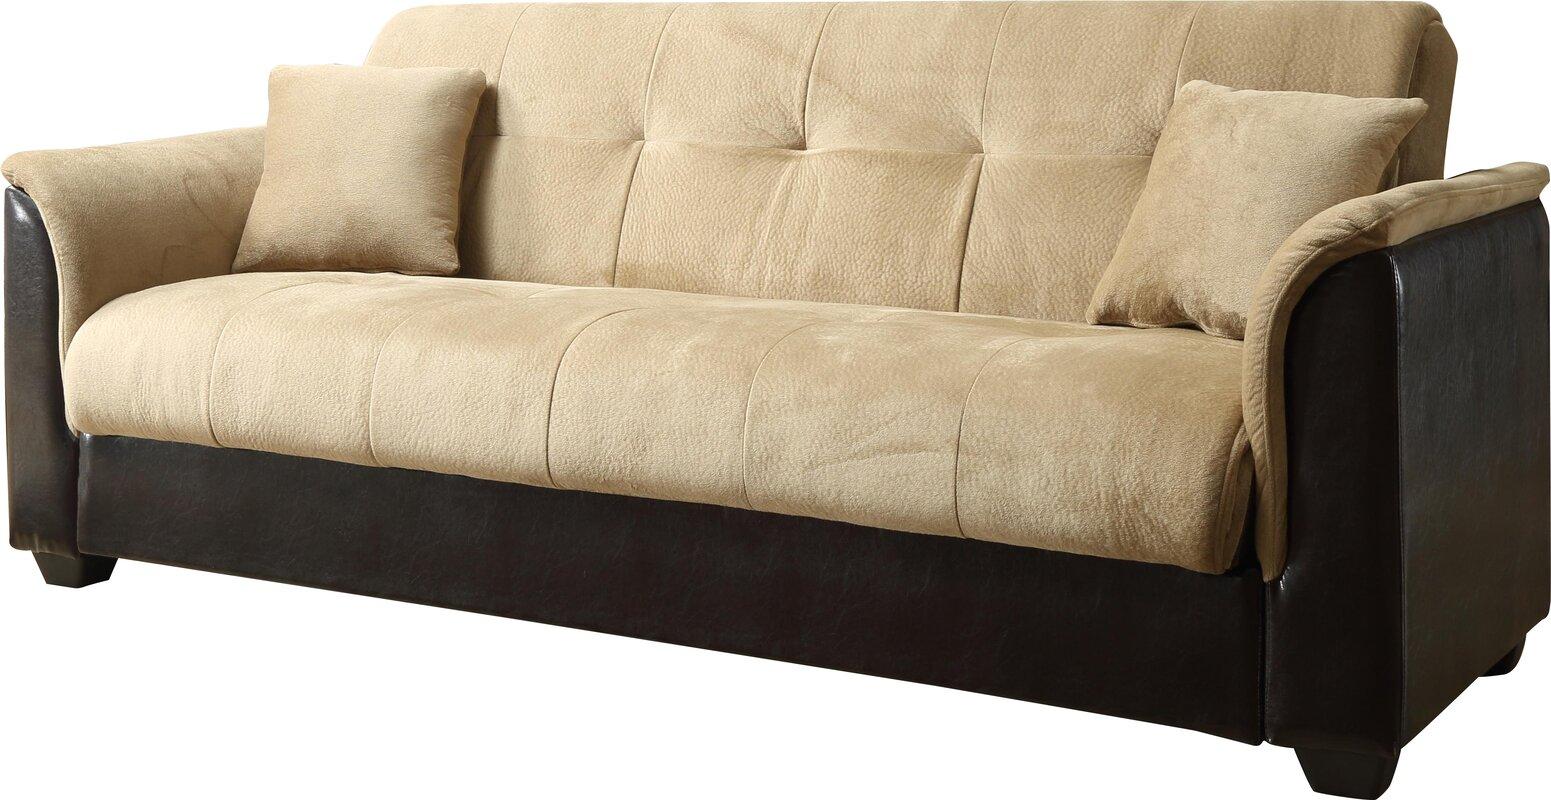 Nice Convertible Sofa